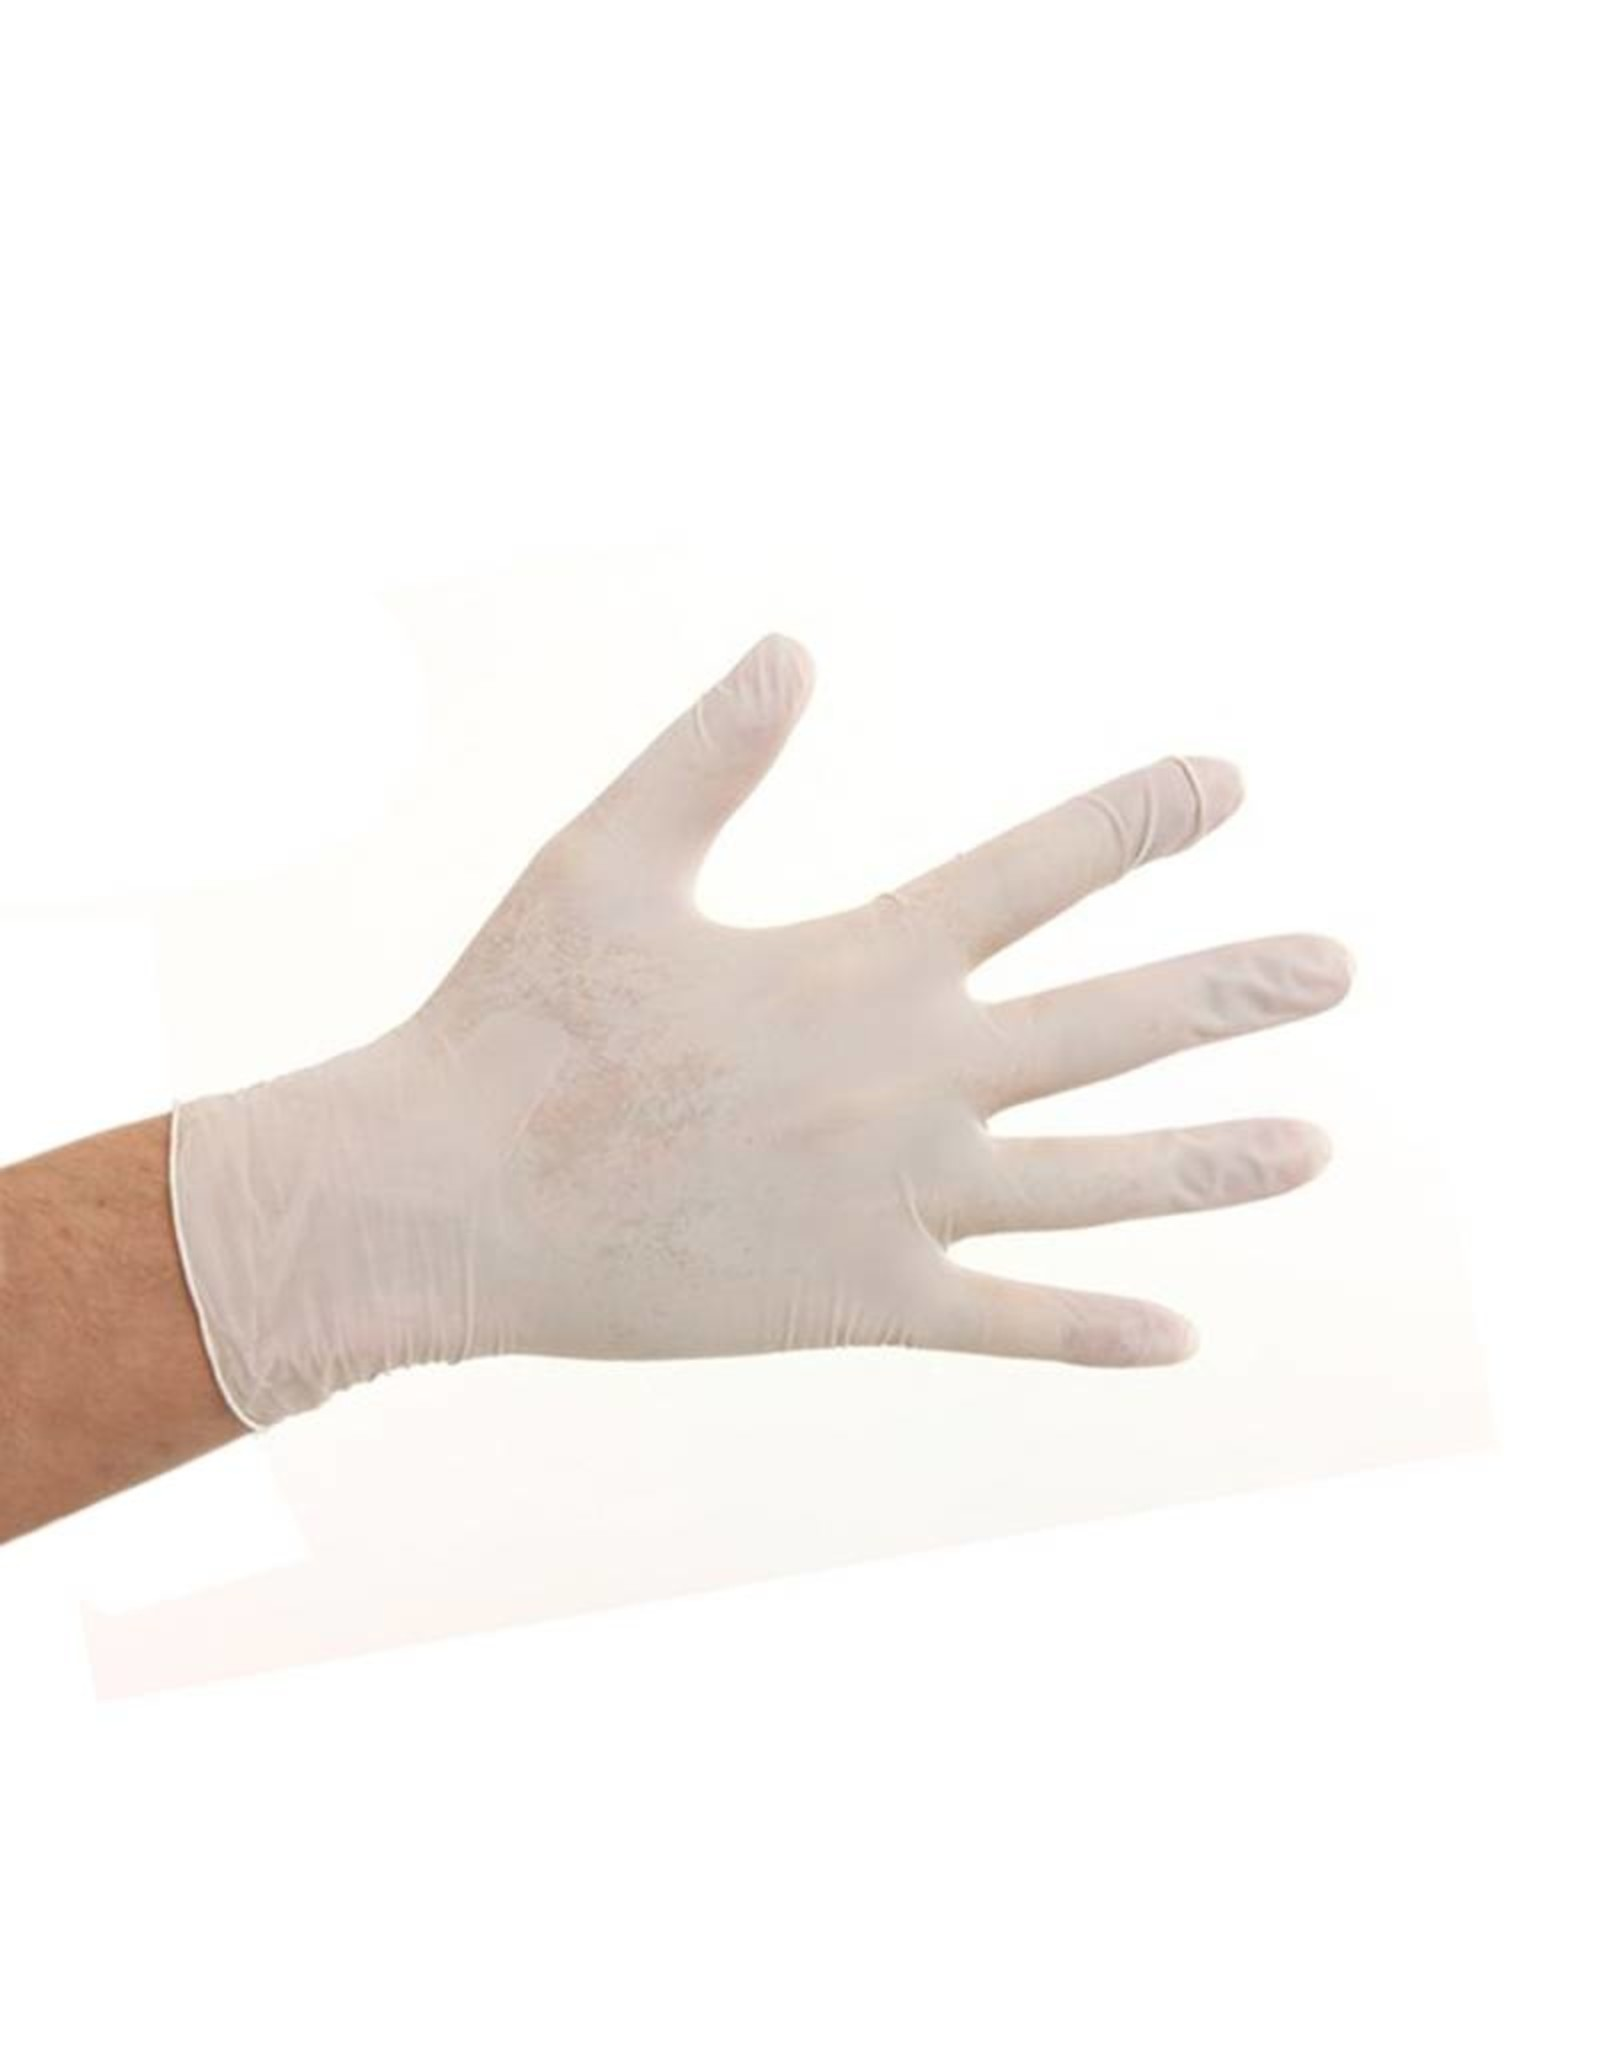 CMT CMT soft nitril handschoenen poedervrij S wit